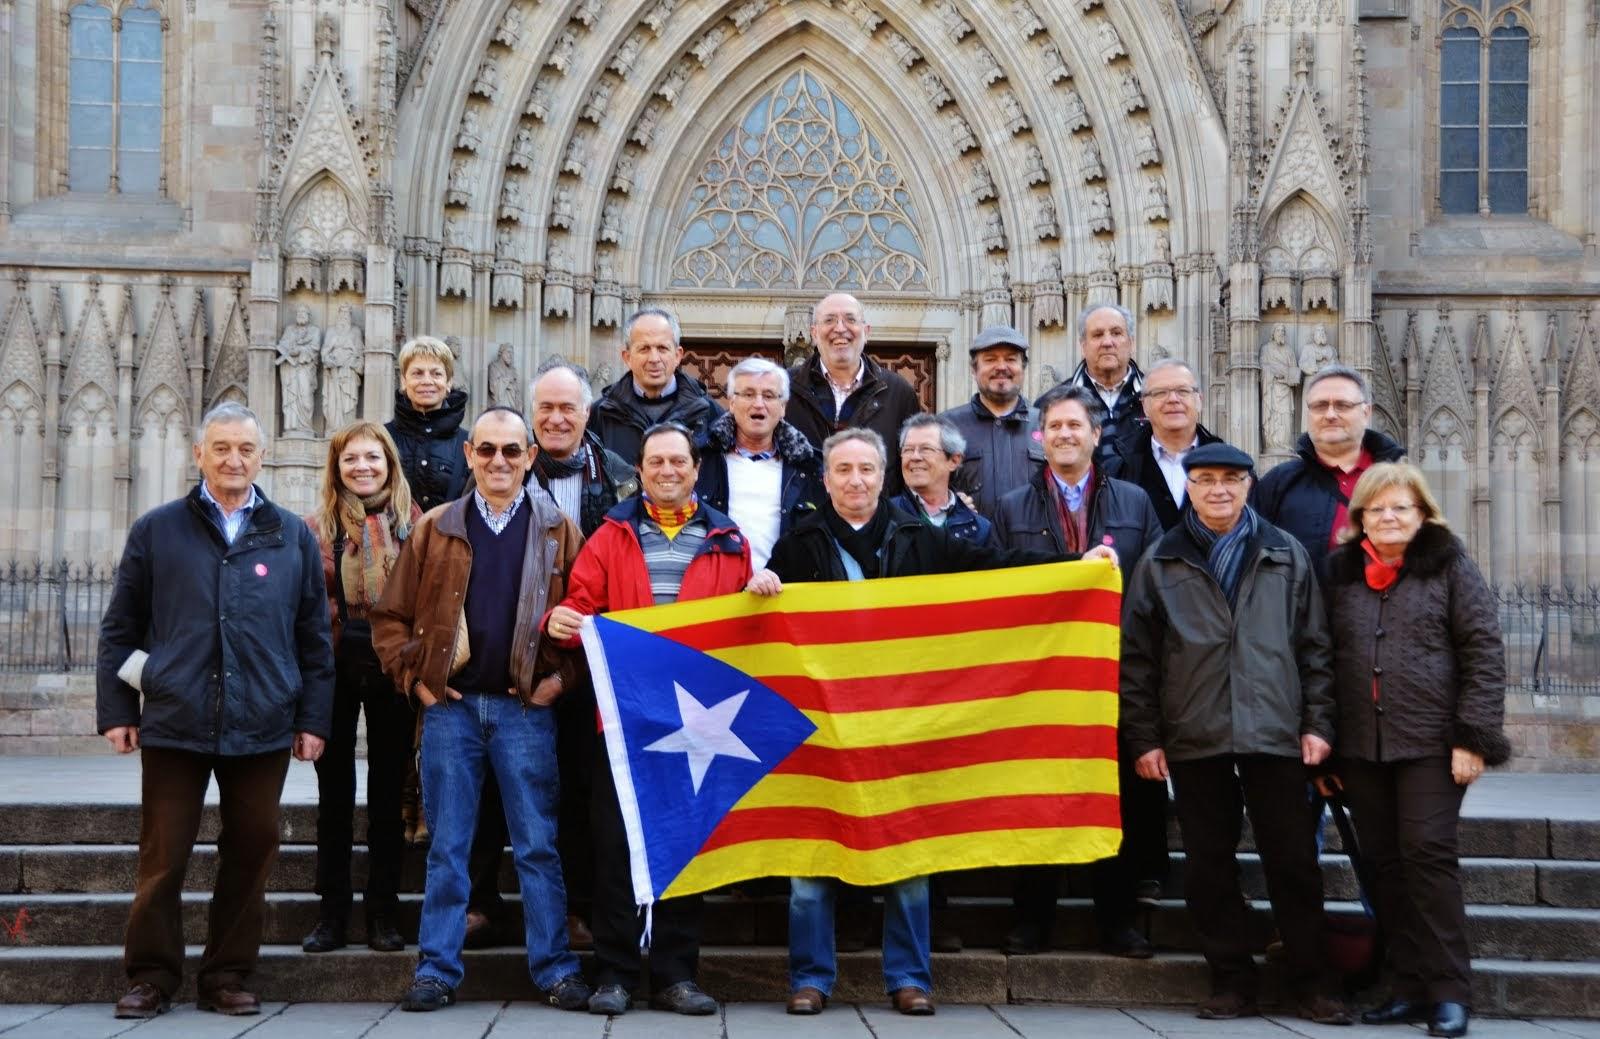 23-1-14 Barcelona i Castelldefels